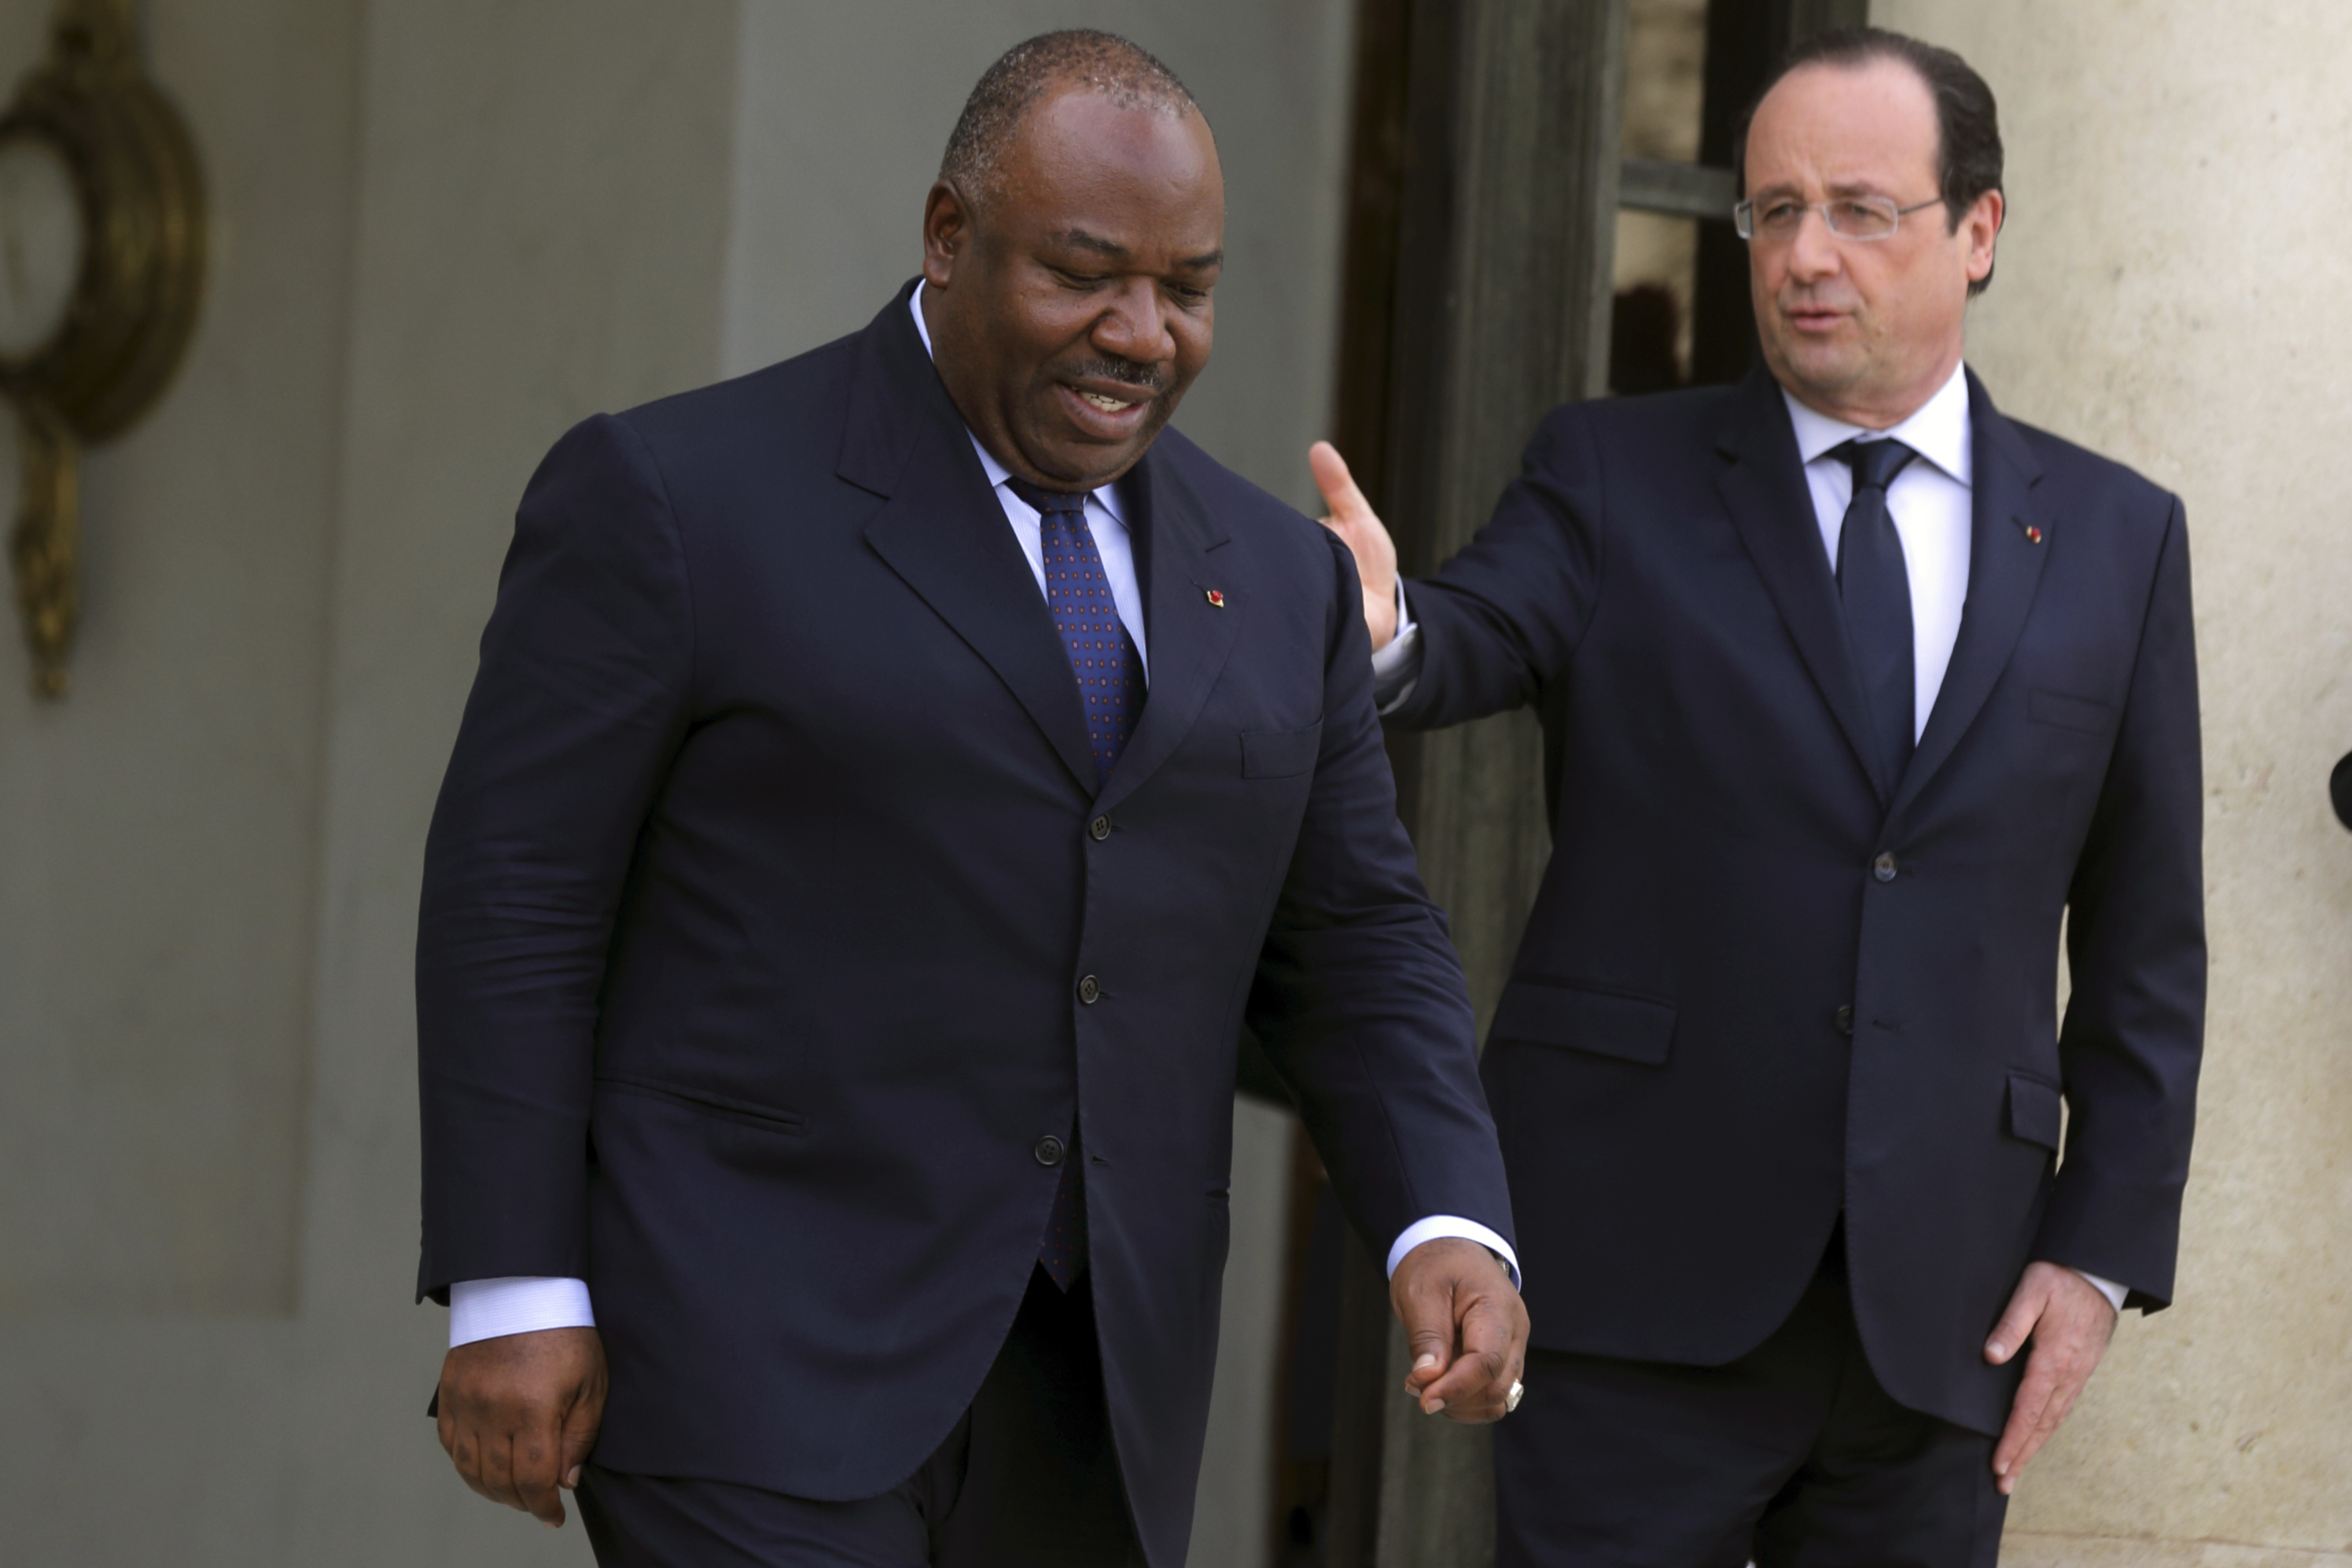 French President Francois Hollande (R) accompanies Gabon's President Ali Bongo Ondimba as he leaves the Elysee Palace in Paris, April 8, 2014. REUTERS/Philippe Wojazer (FRANCE - Tags: POLITICS) - RTR3KE5N